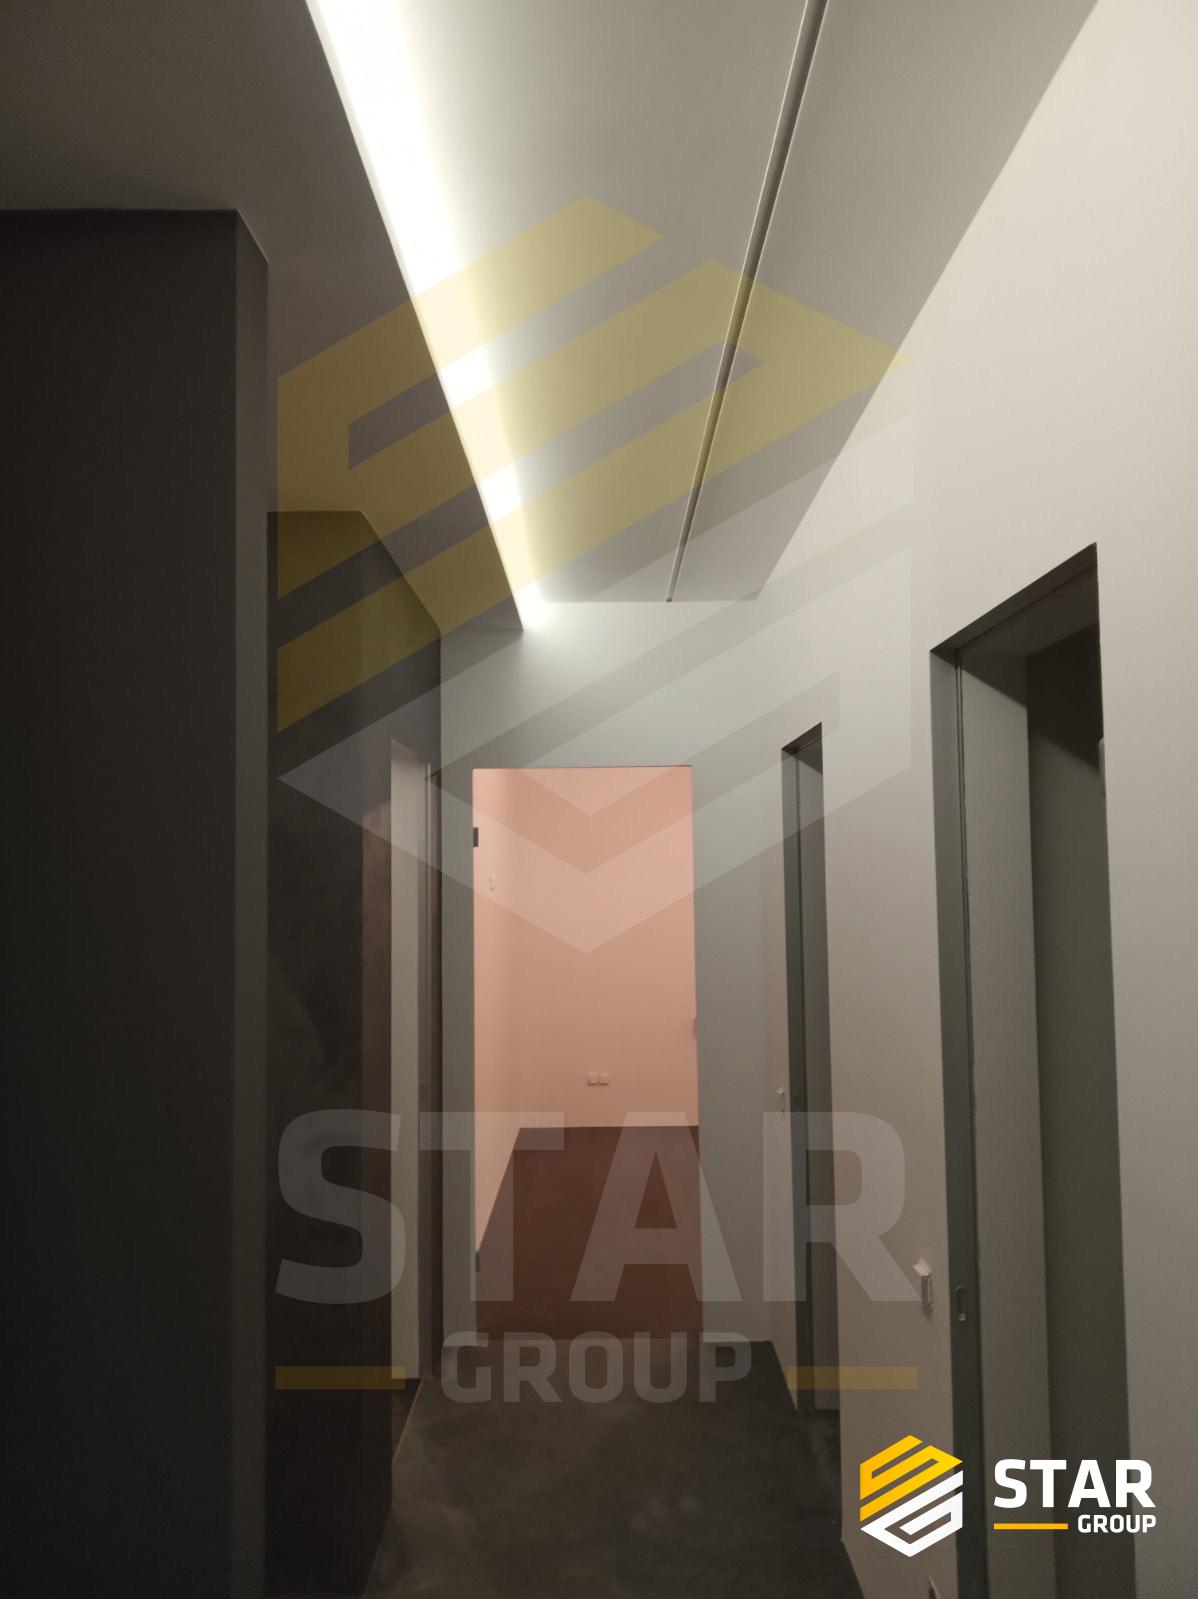 Фото -Монтаж потолка из ГКЛ -Шпаклевка -Покраска -Декоративная штукатурка